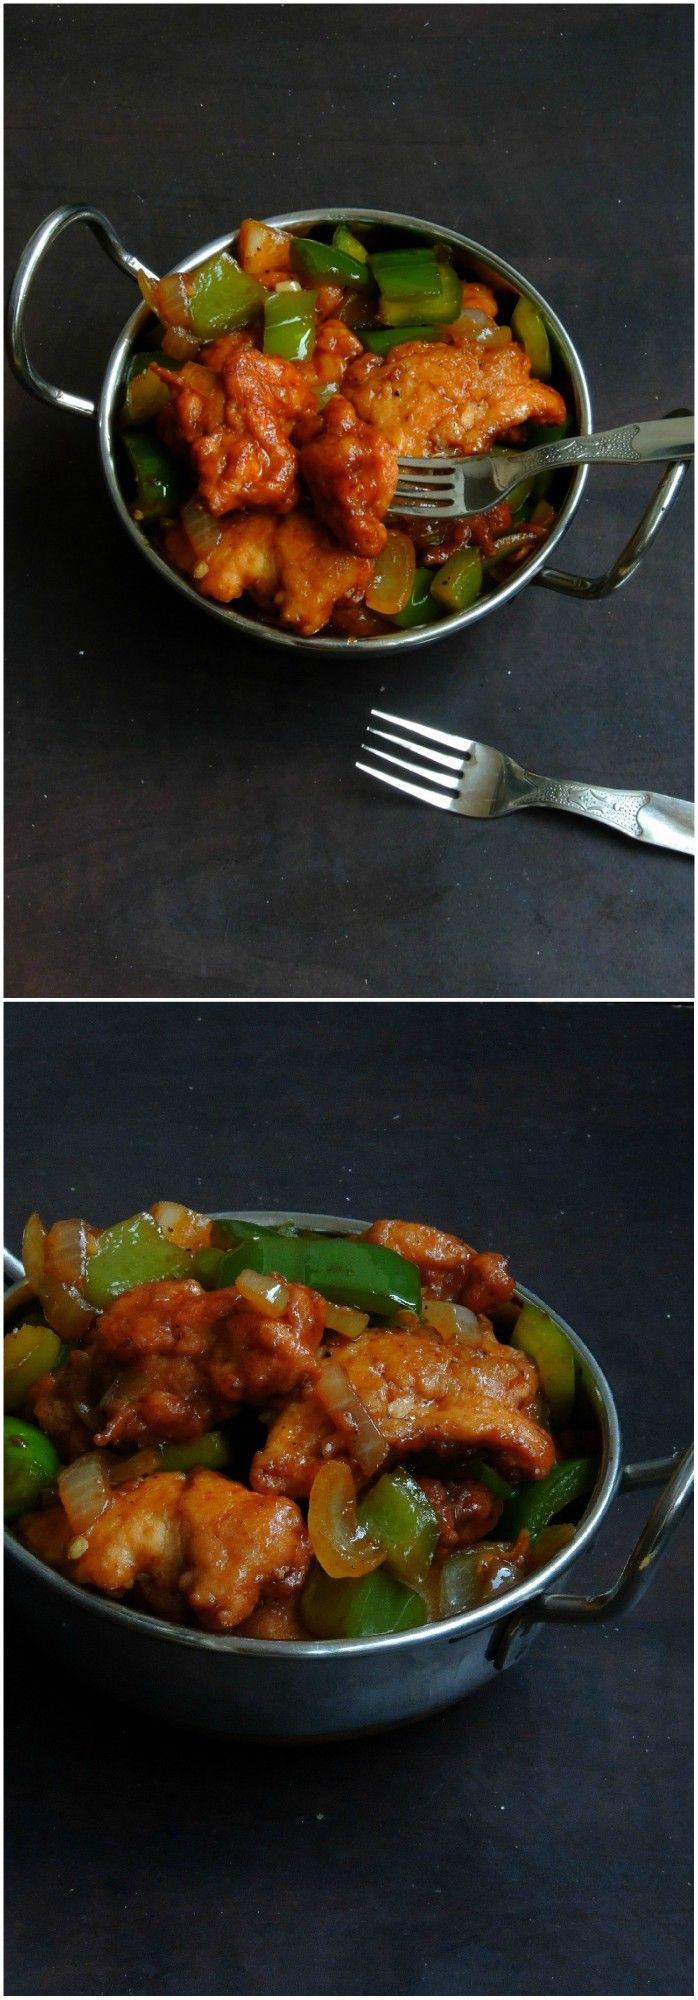 Cauliflower Manchurian/Gobi Manchurian